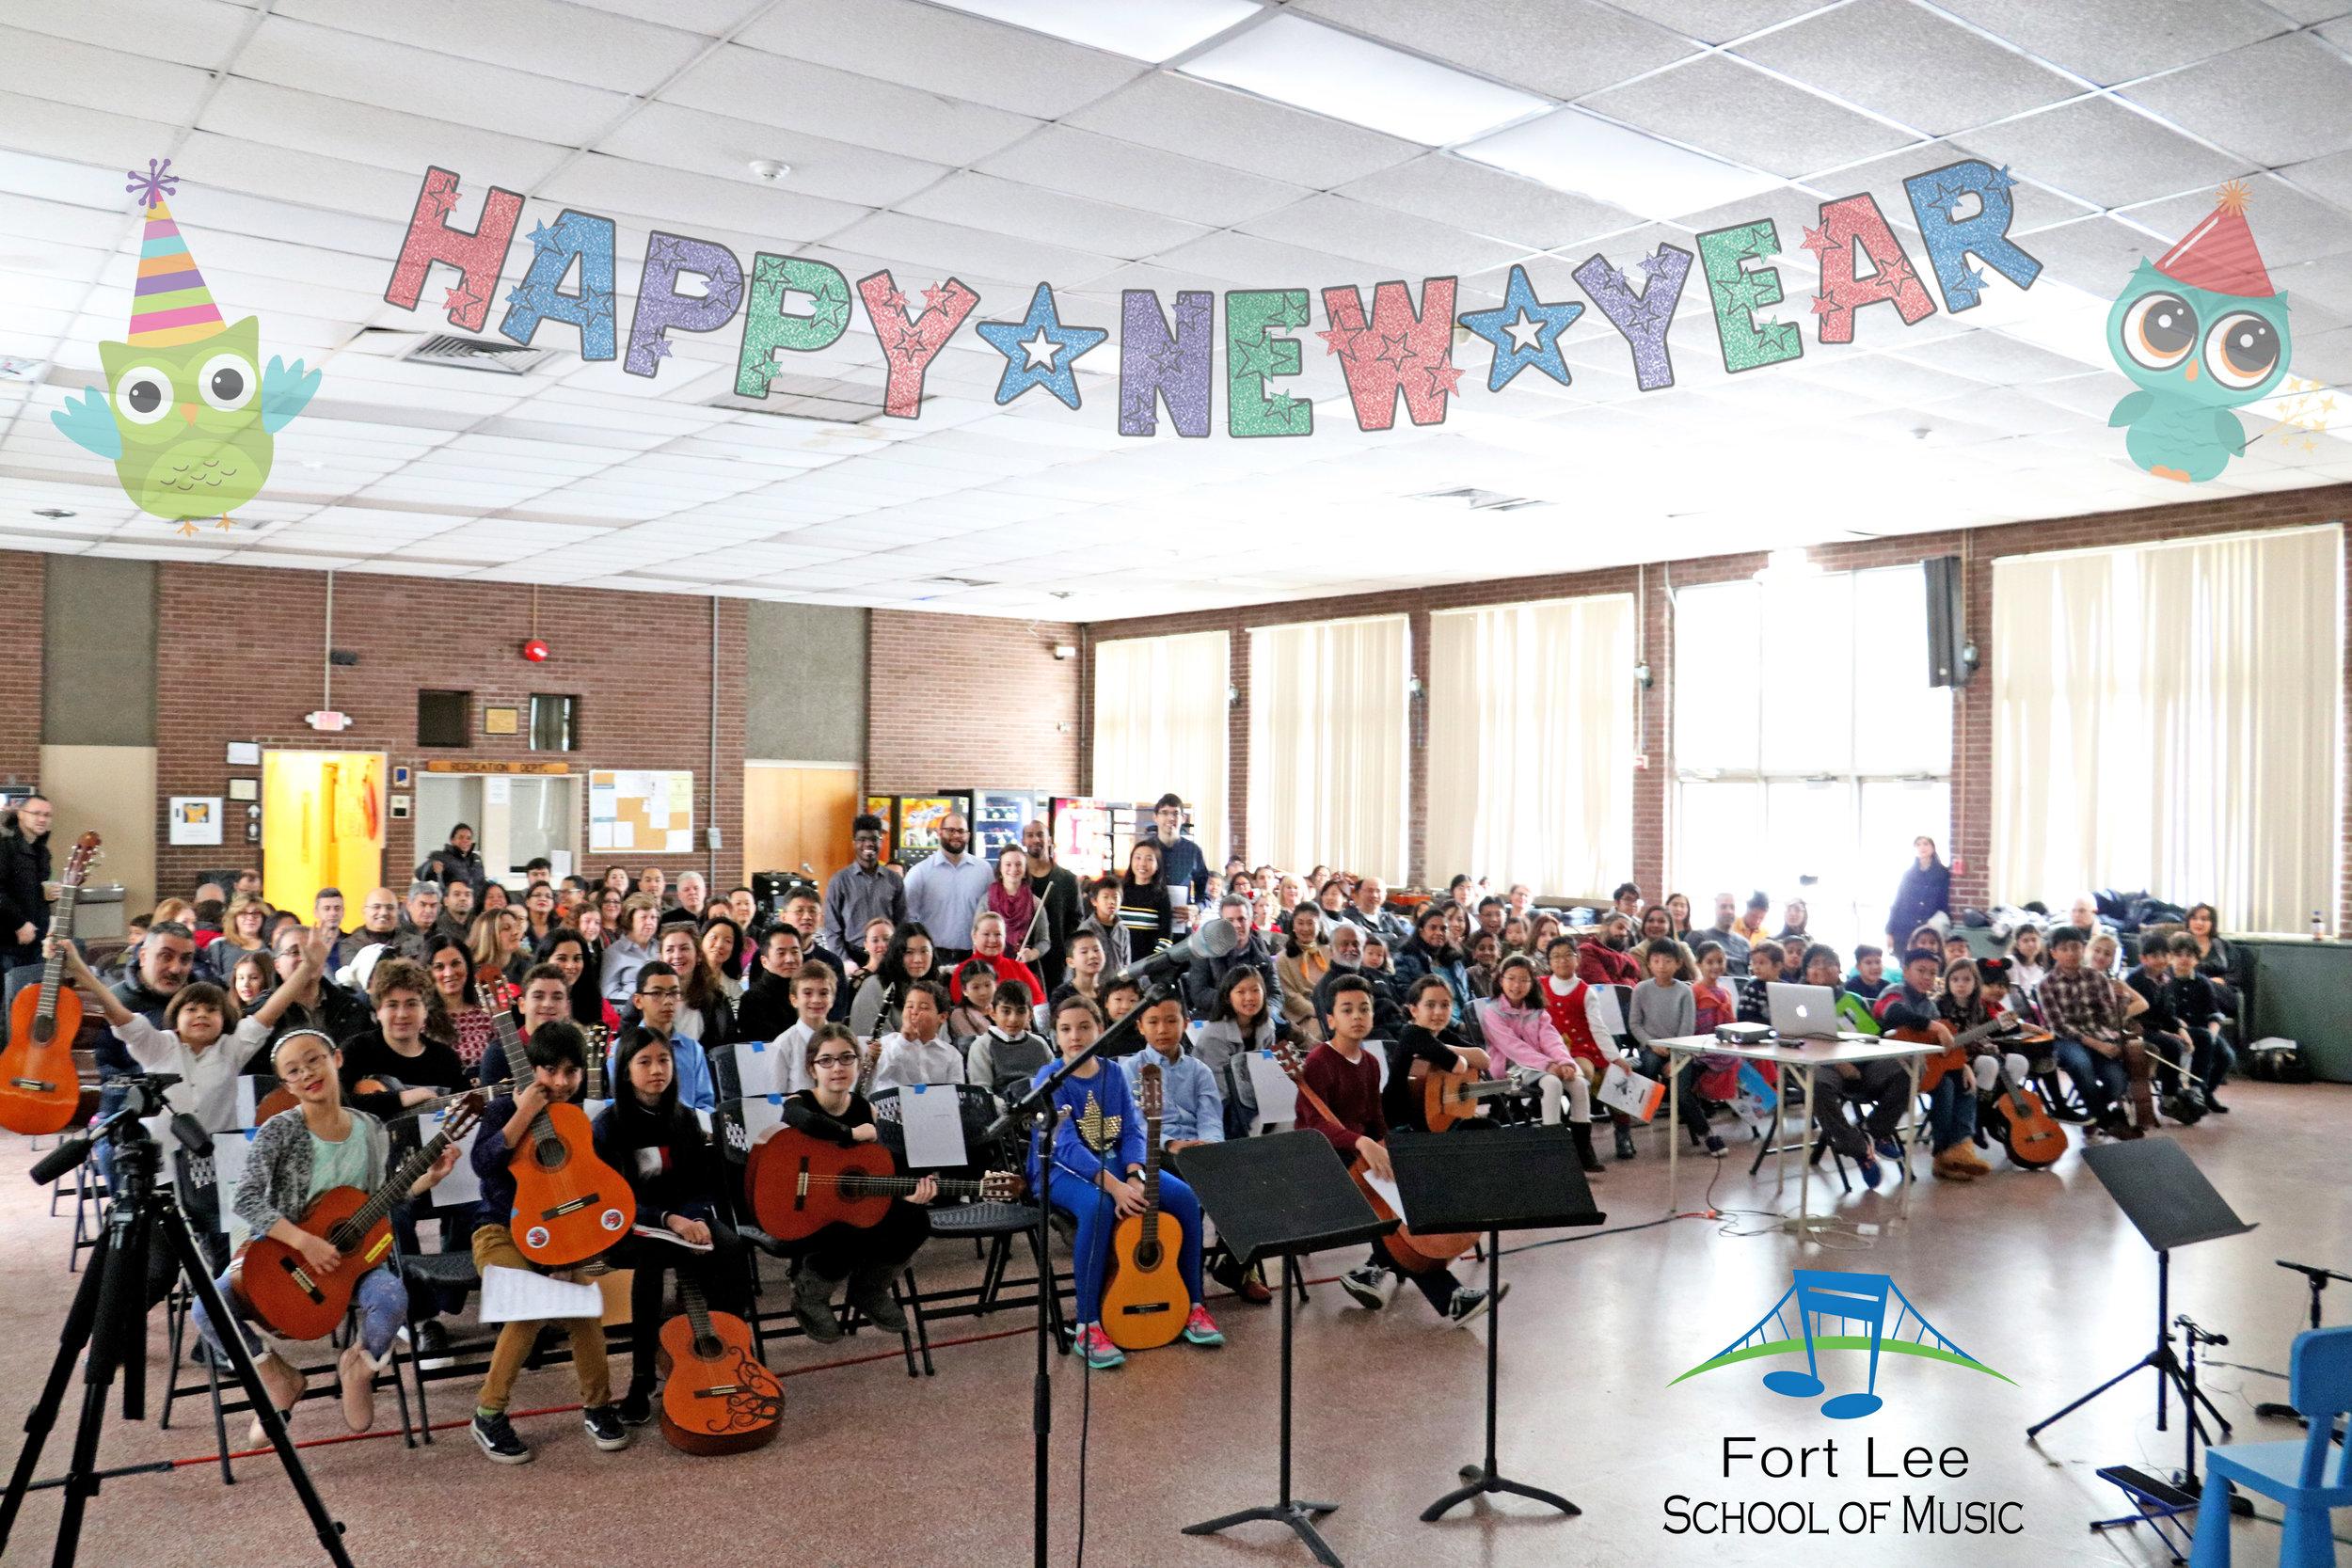 Happy New Year - Fort Lee School of Music.jpg